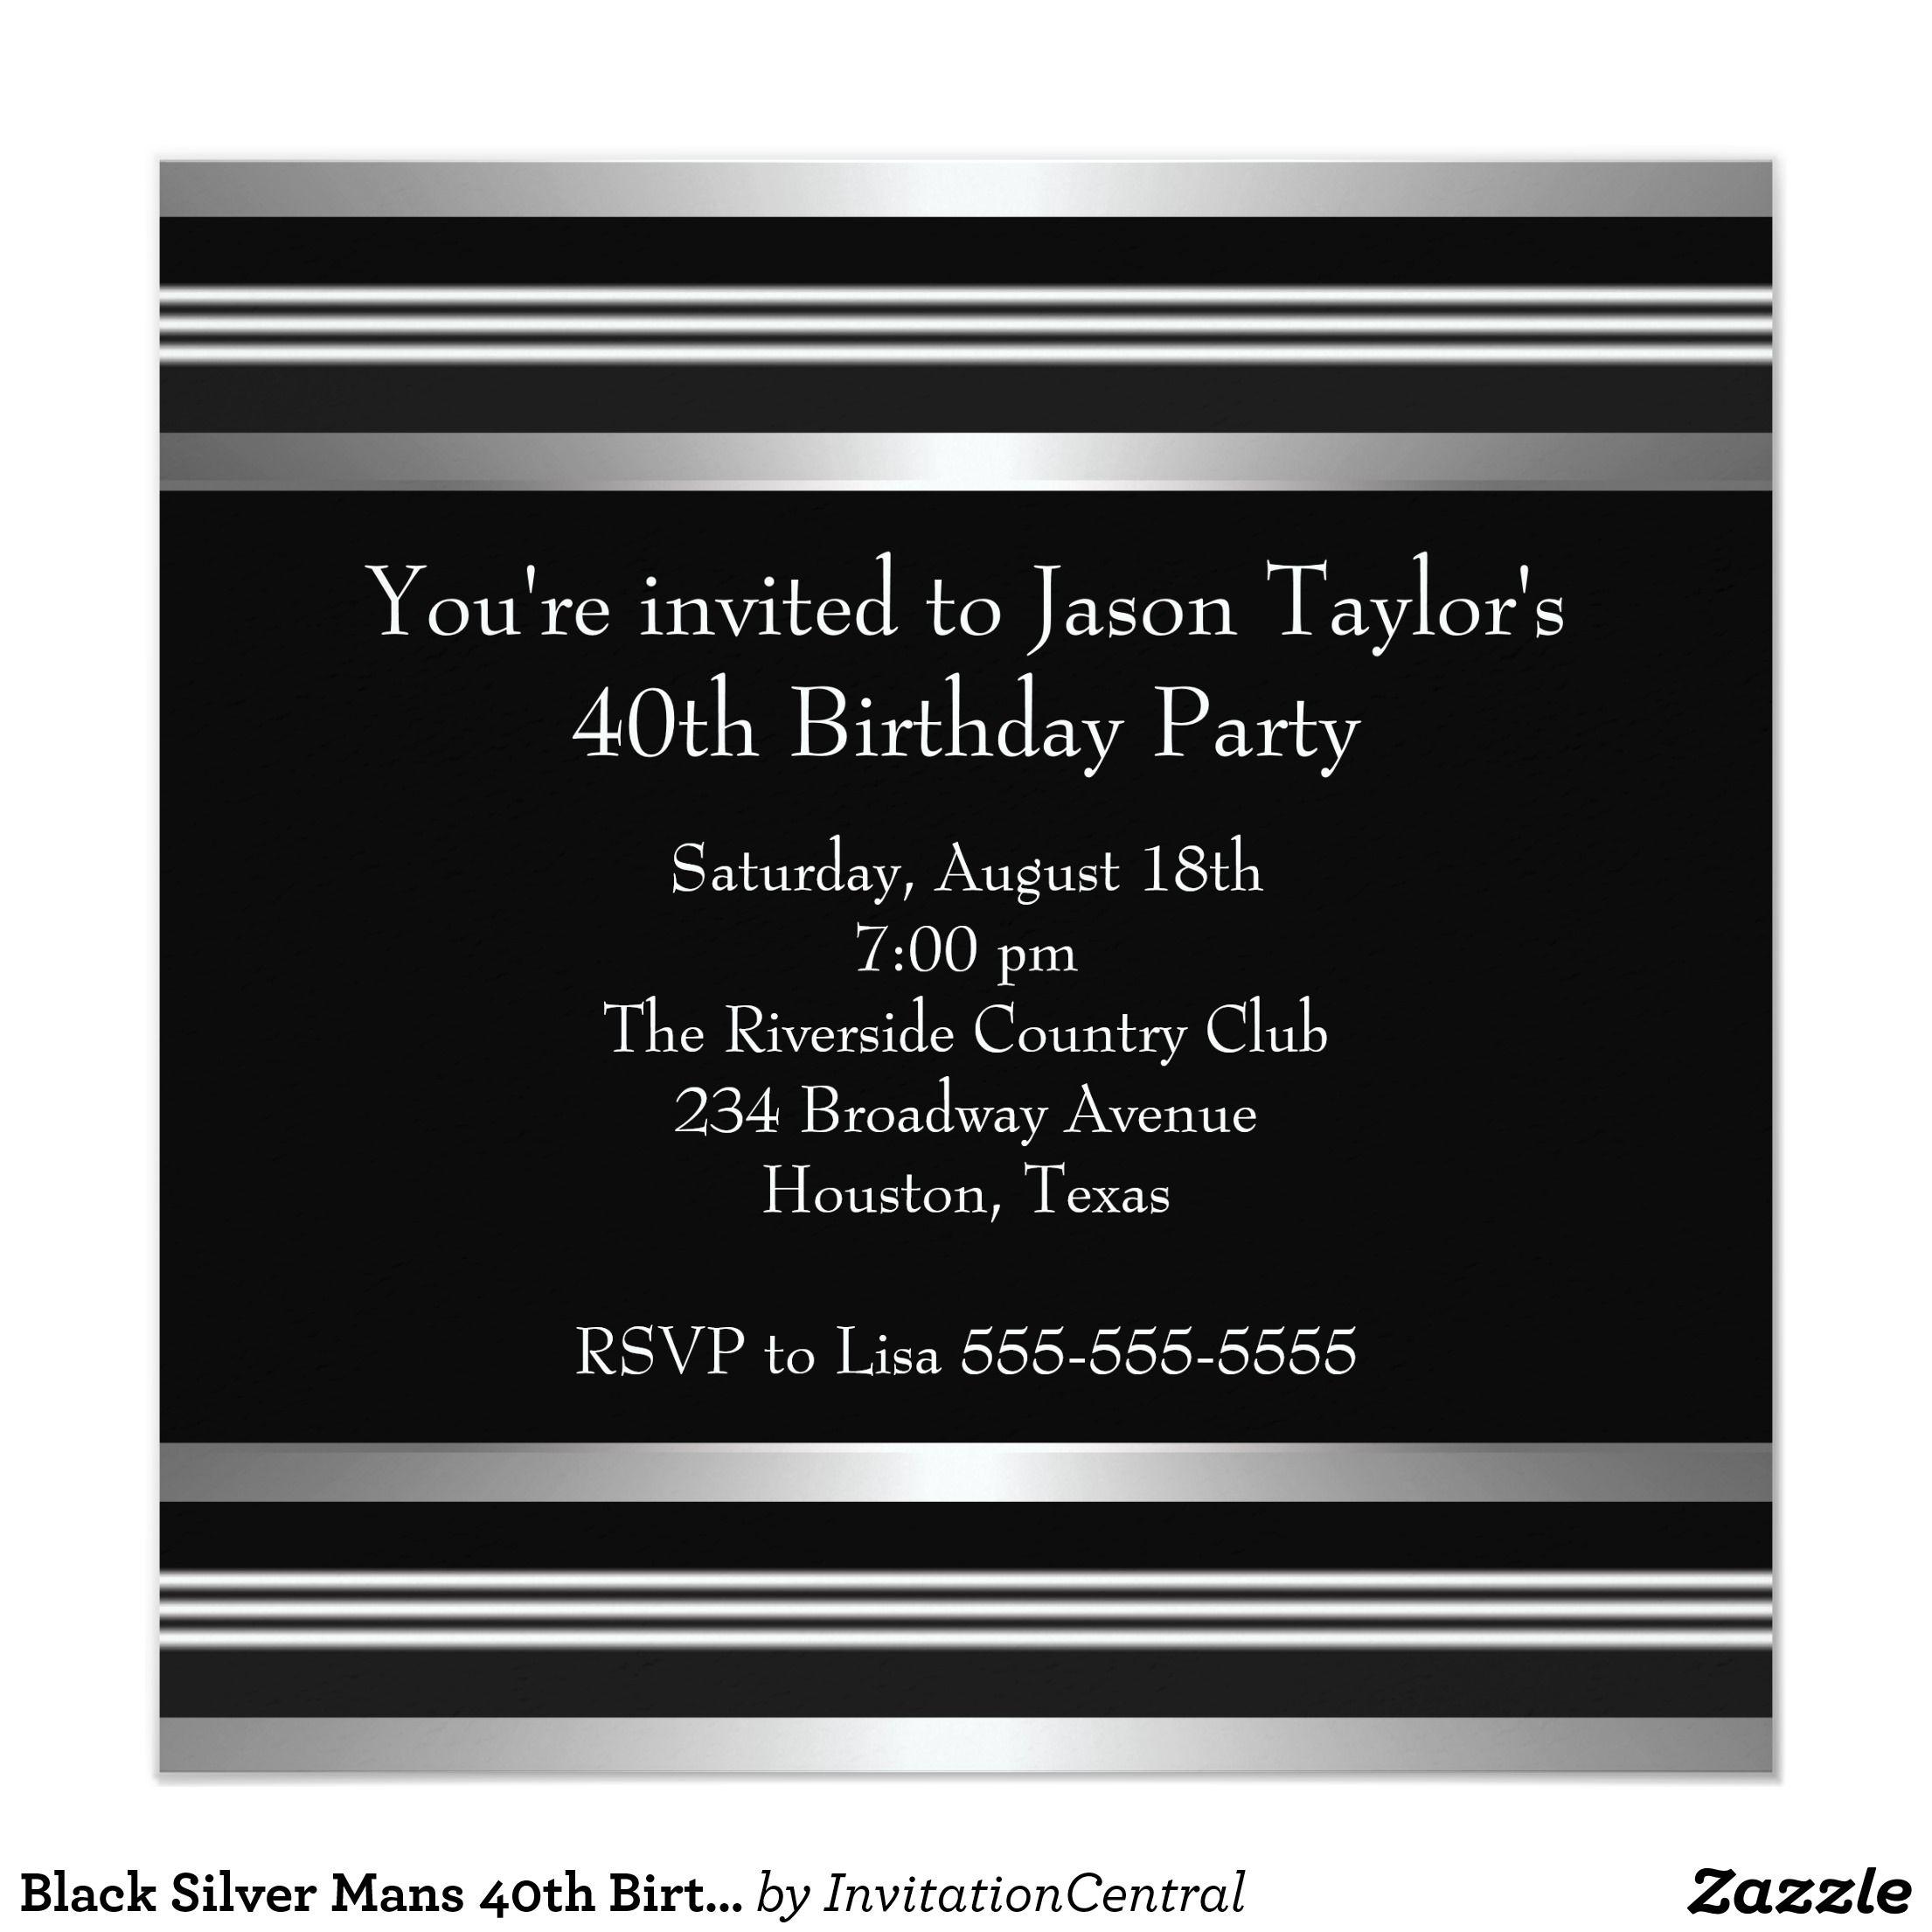 Black Silver Mans 40th Birthday Party Card Silver Man 40th